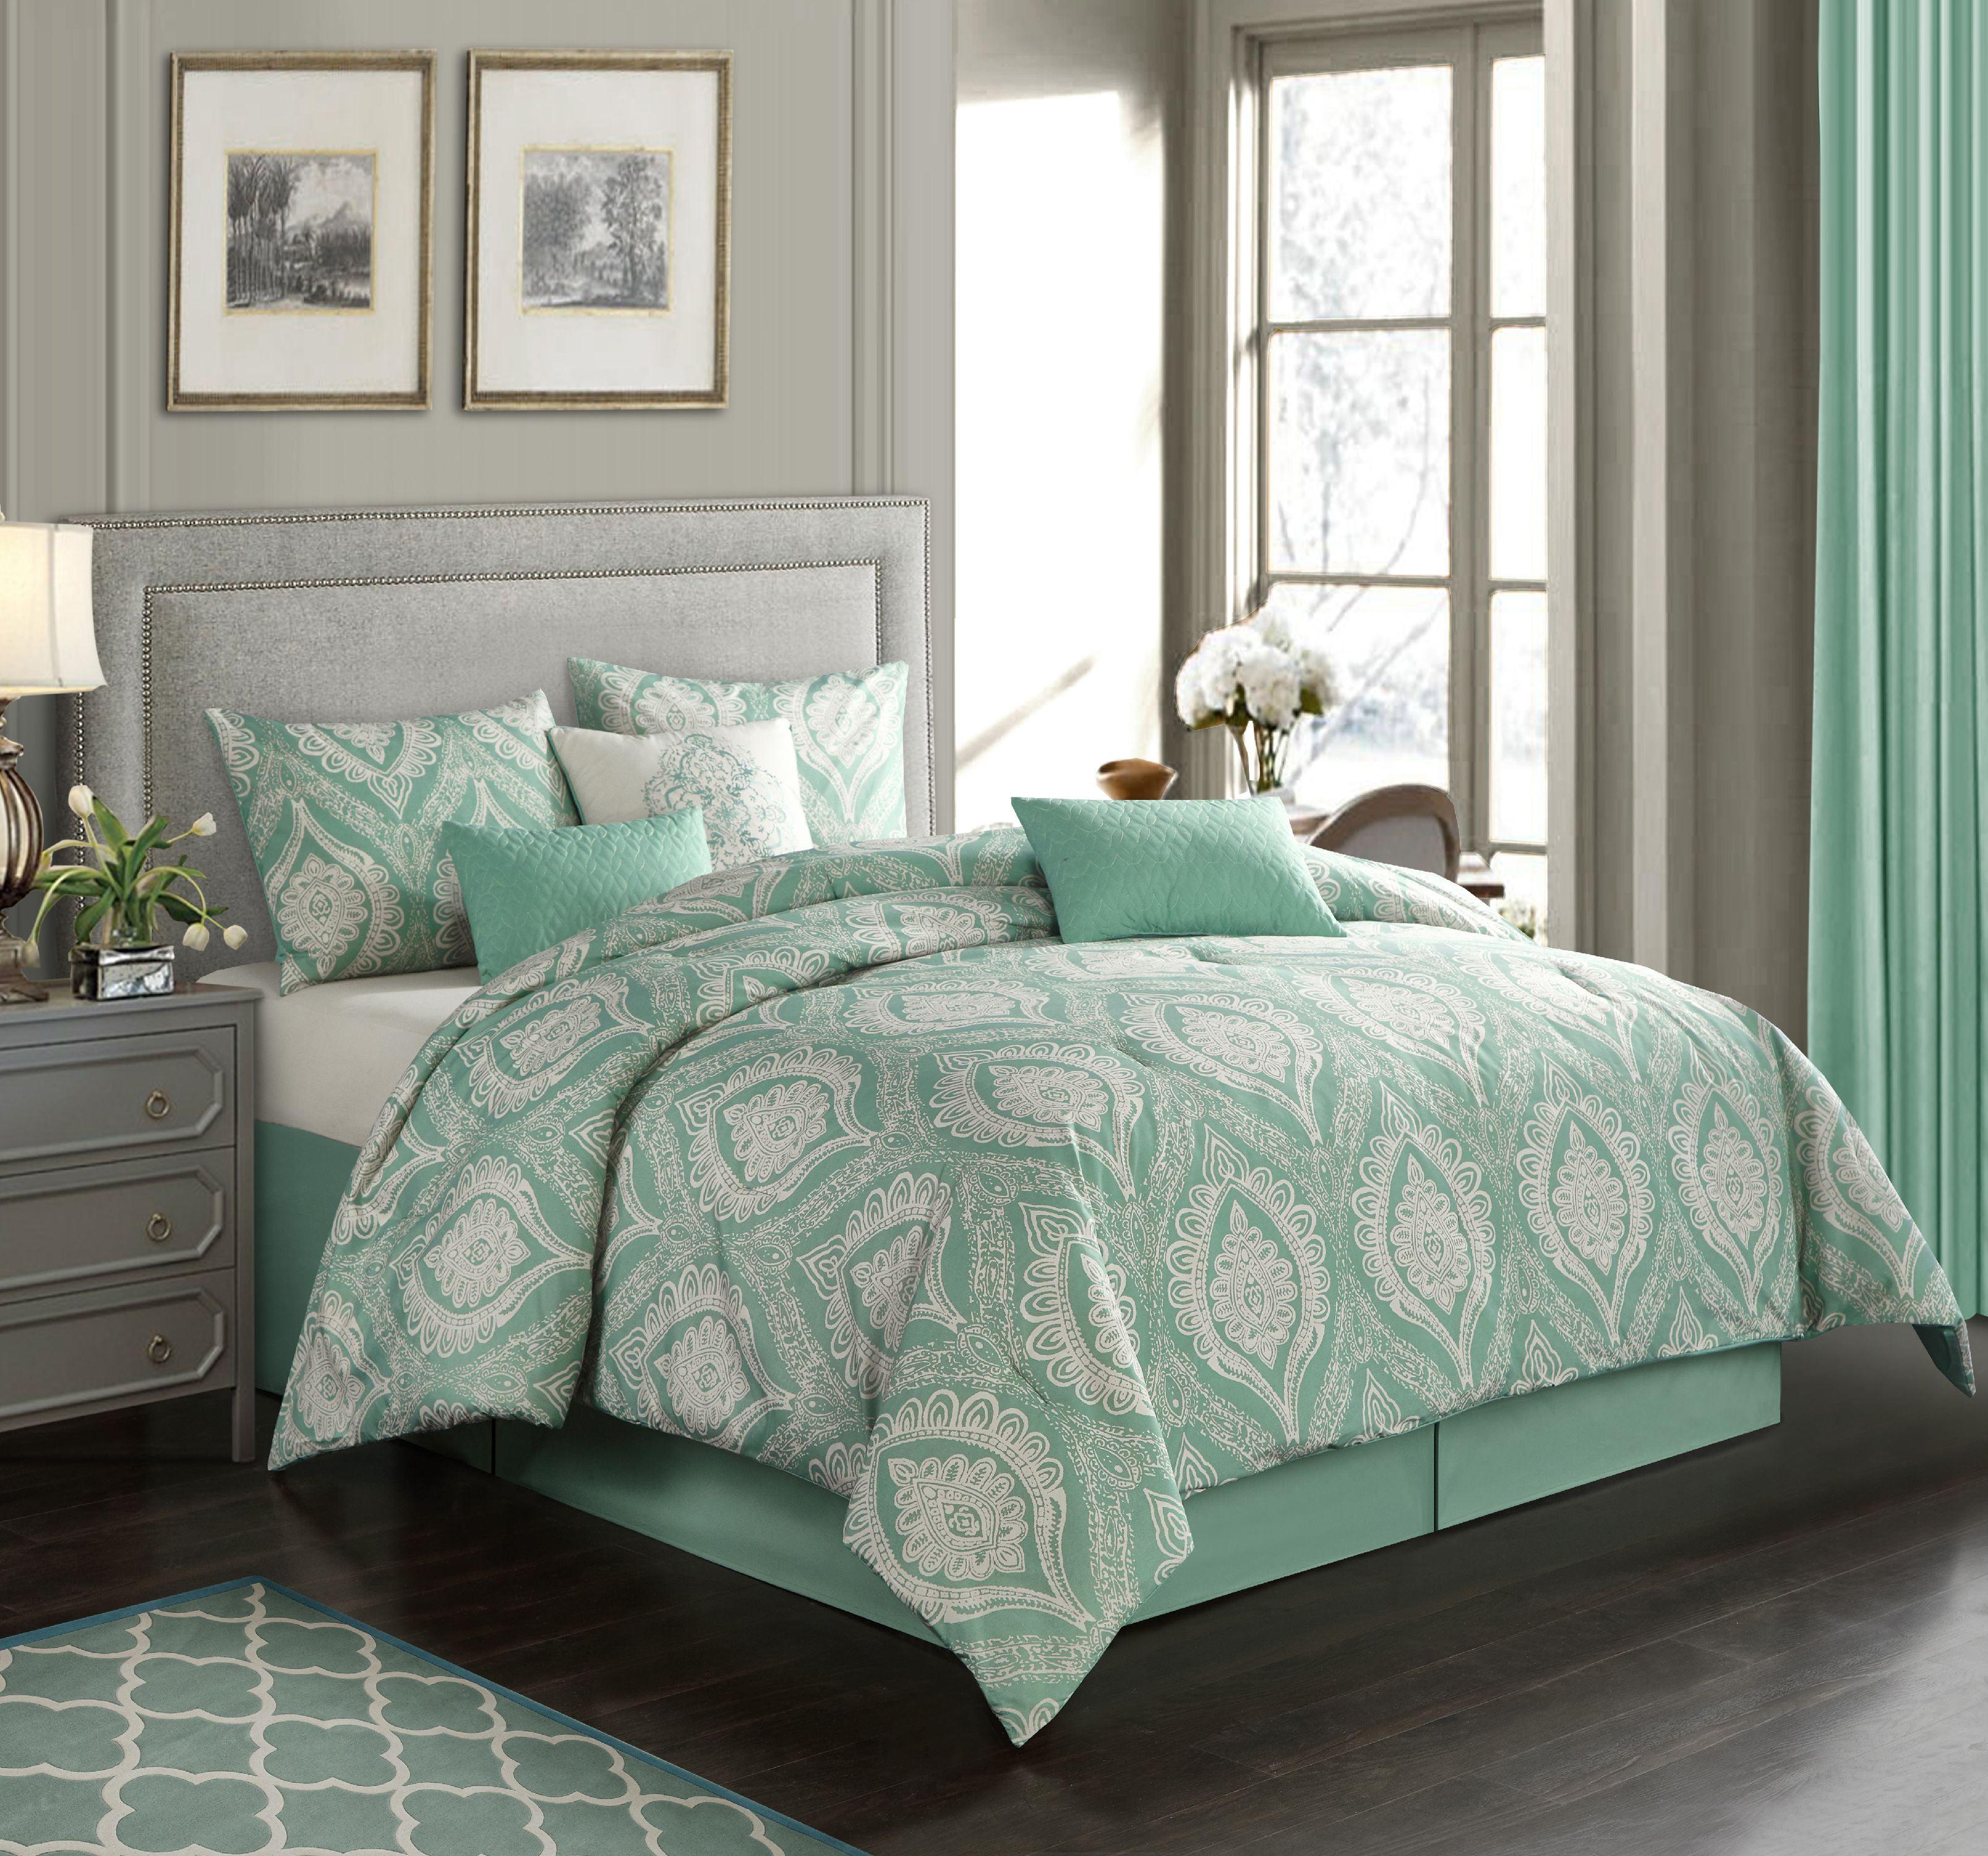 Elegant Farmhouse by Nanshing Safara 7-Piece Comforter Set